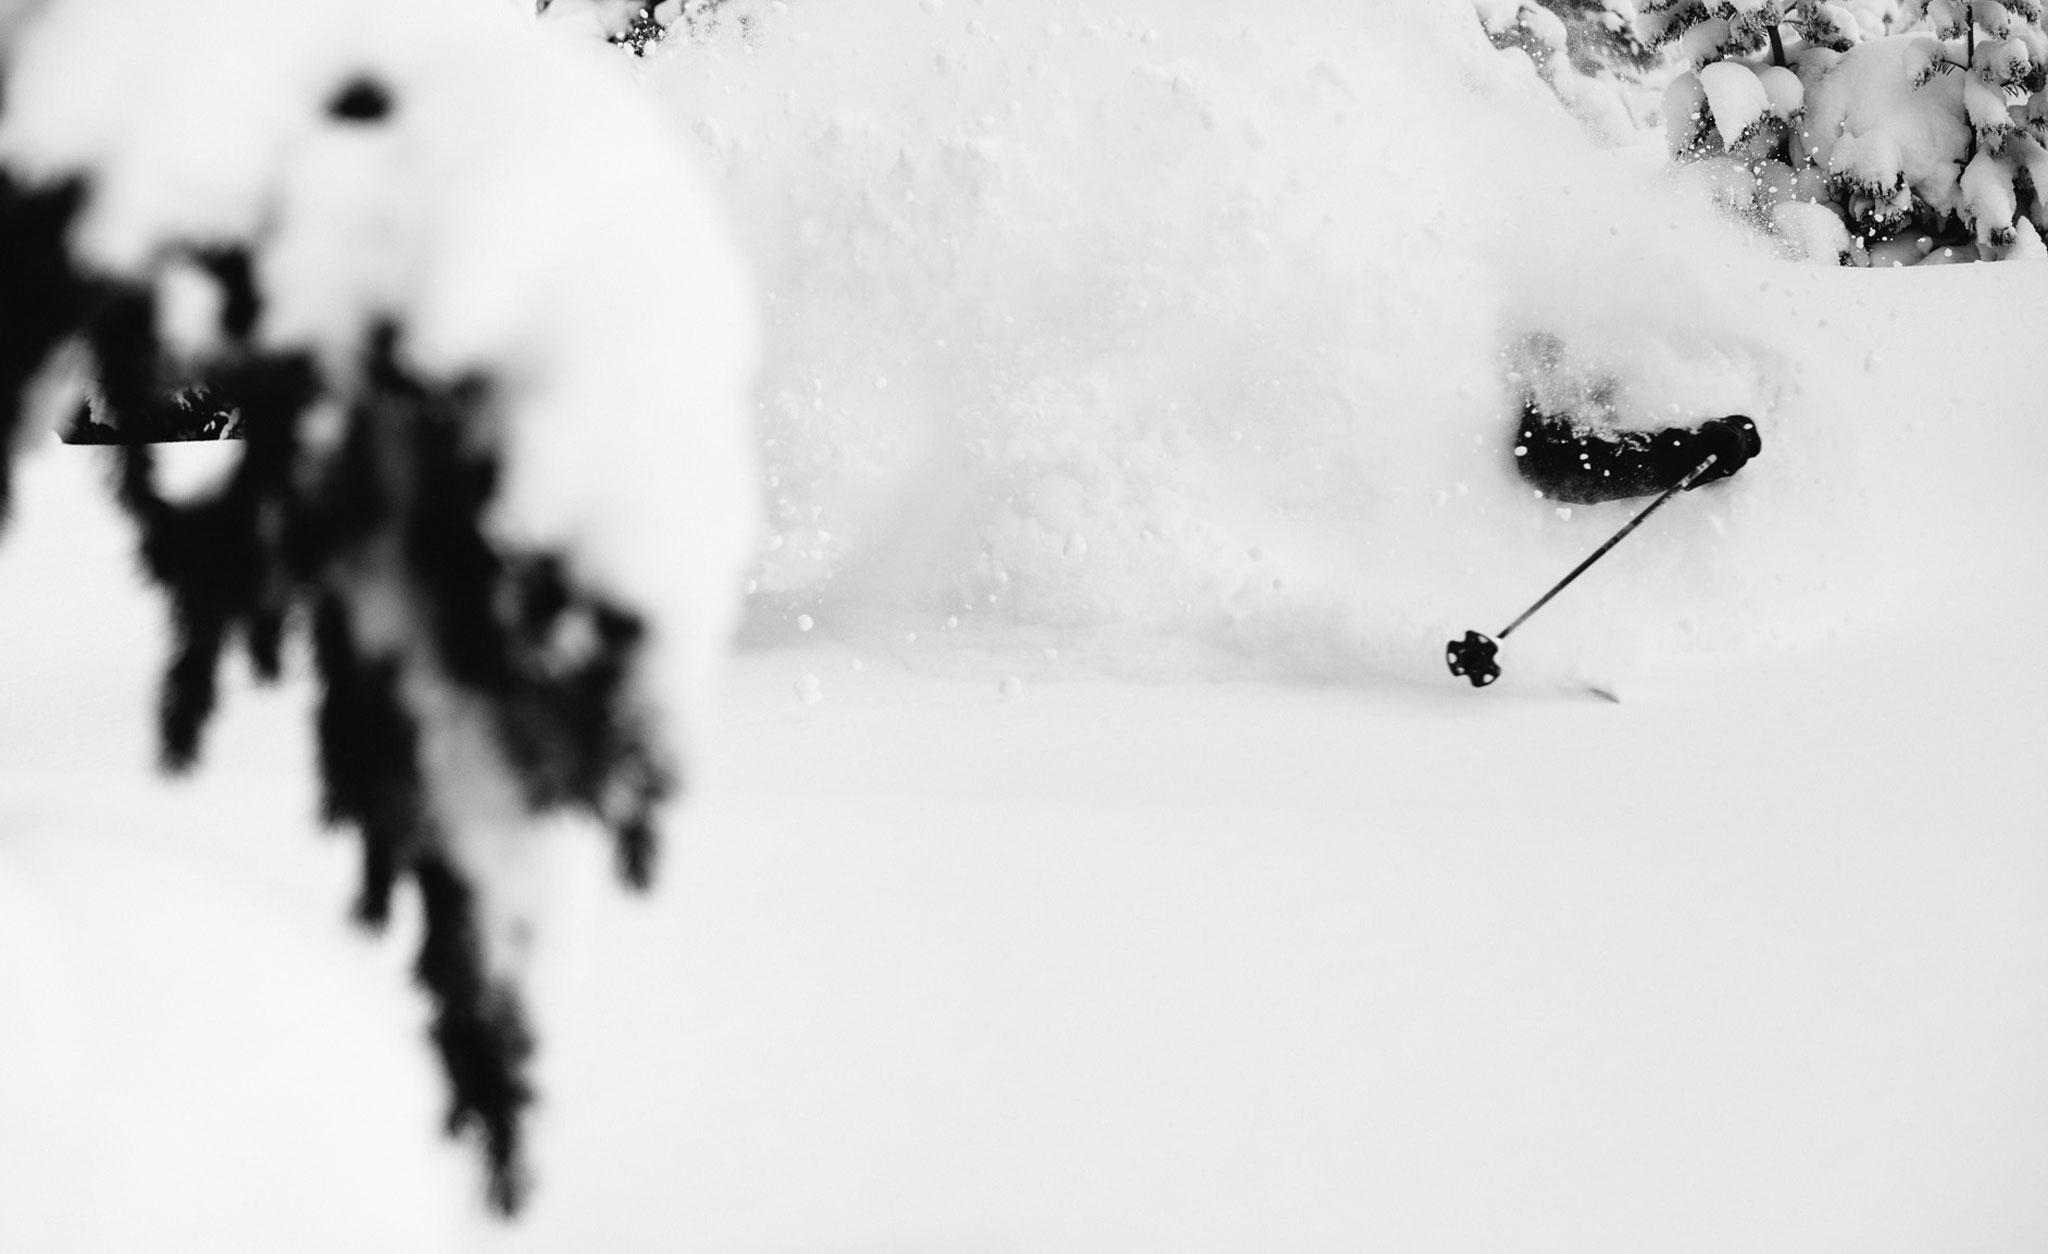 Mystery Skier